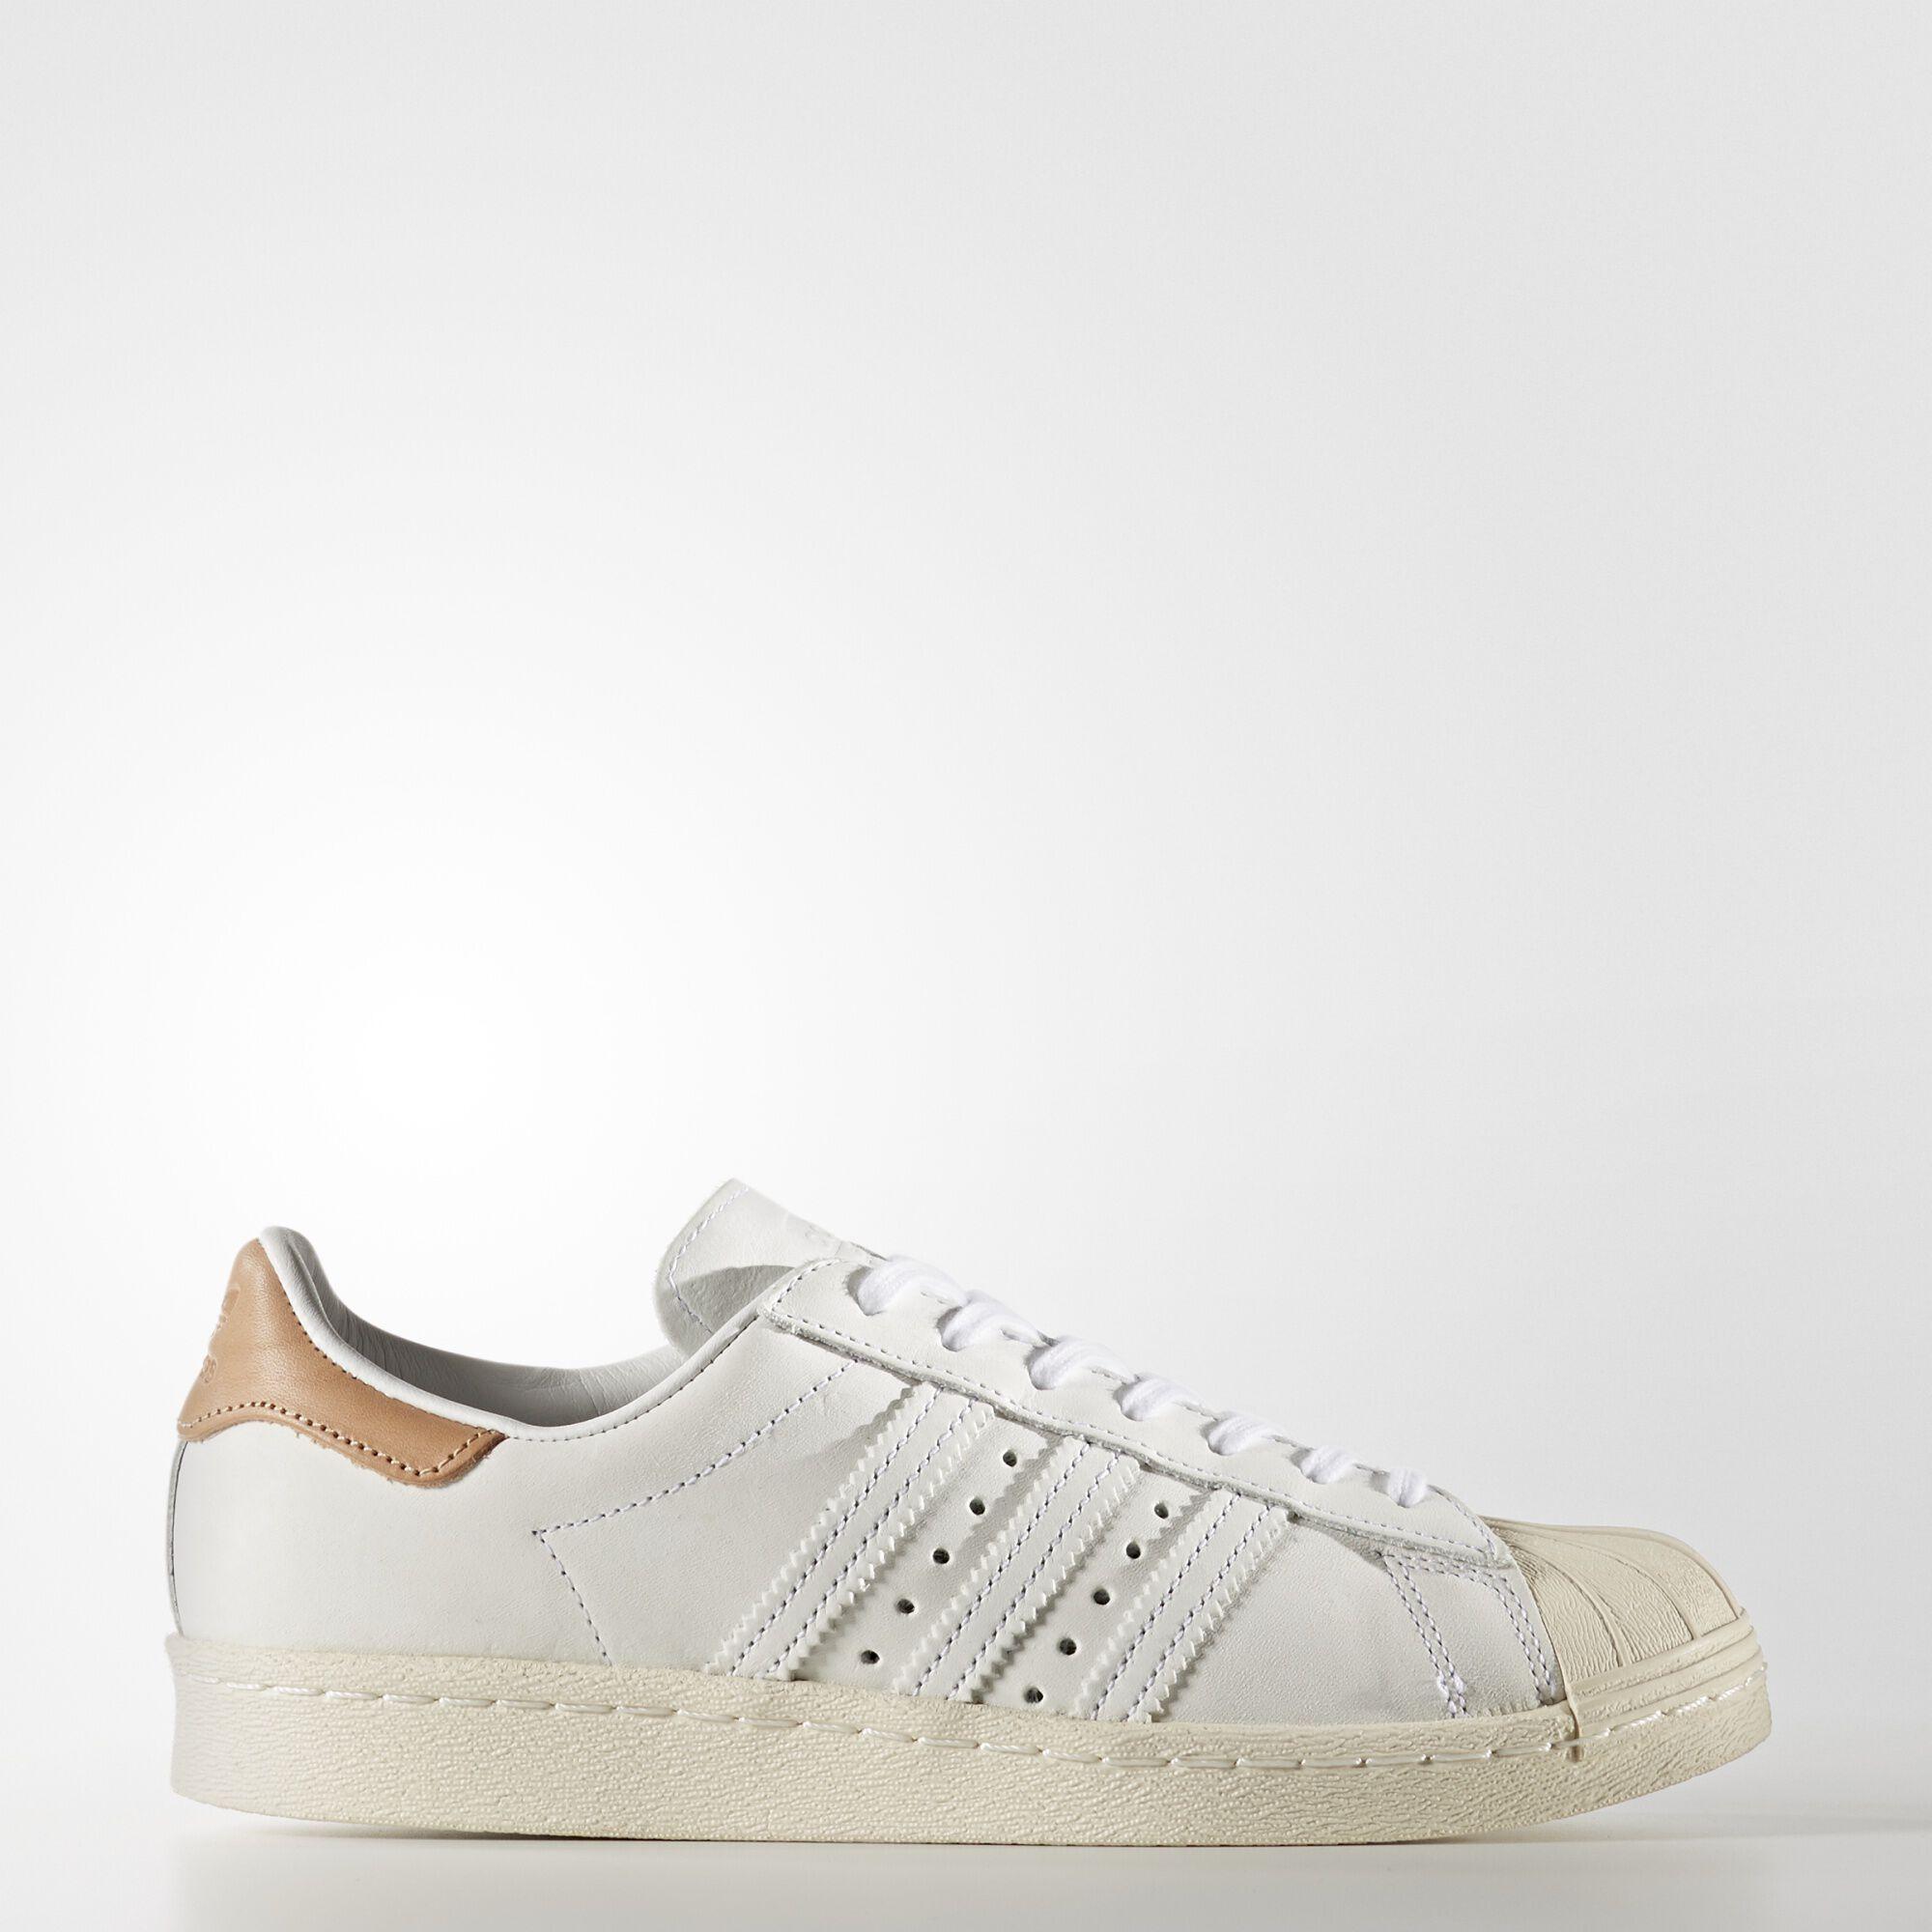 Superstar Adidas Dorée